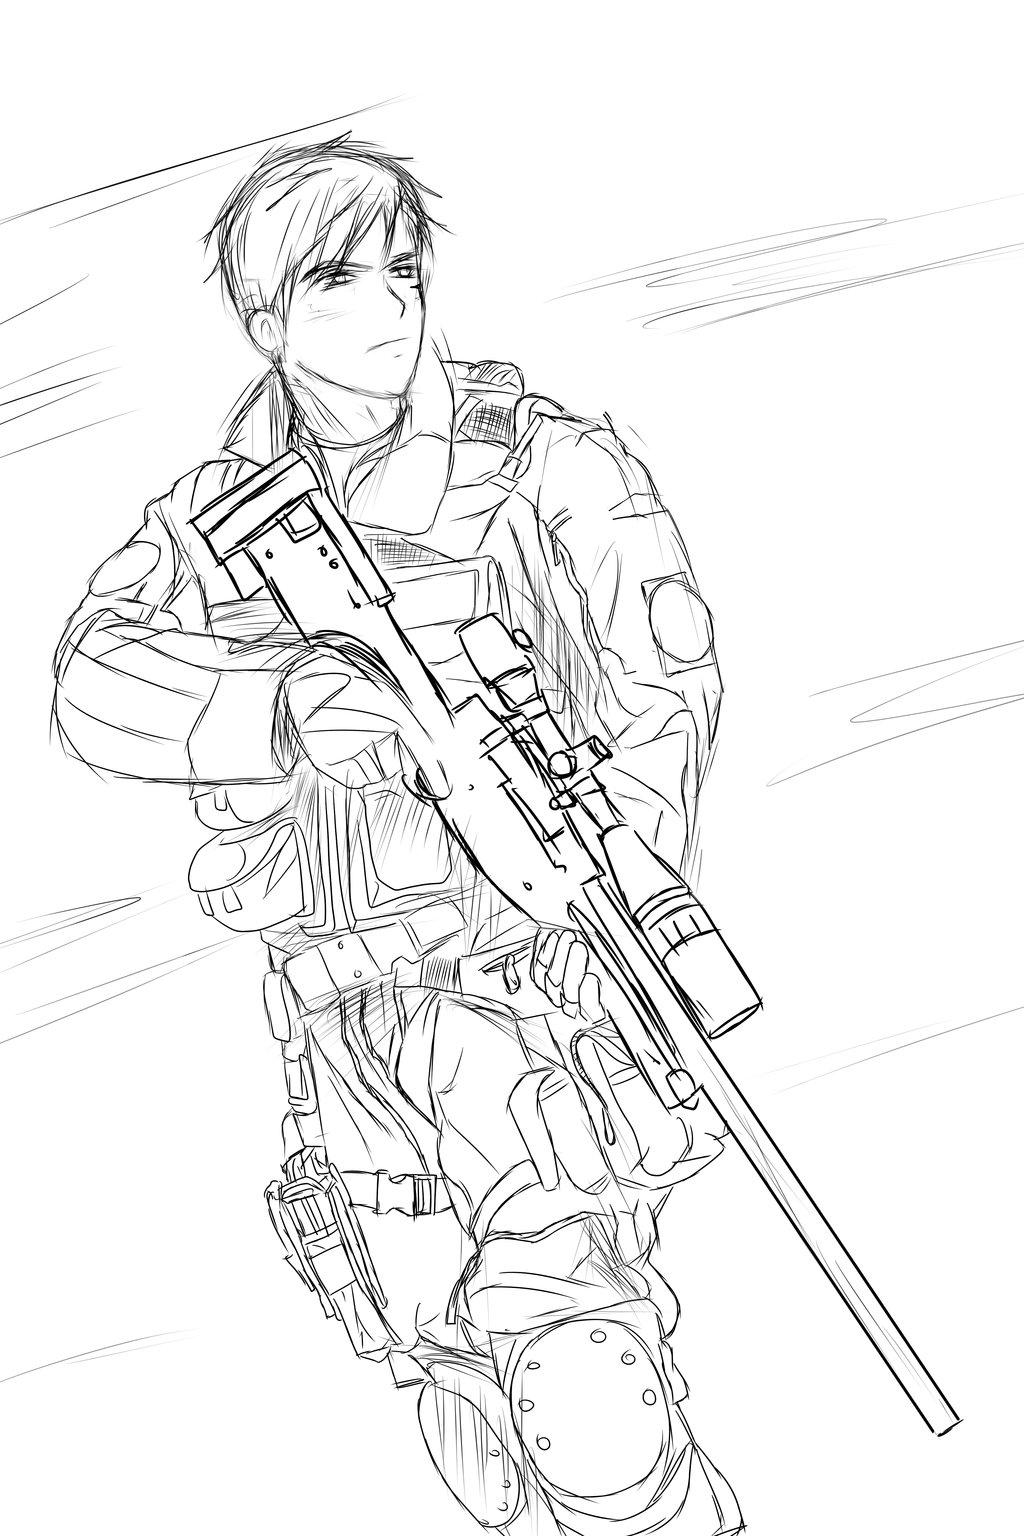 1024x1536 Aoh Army Meme Sketch By Djroguefire